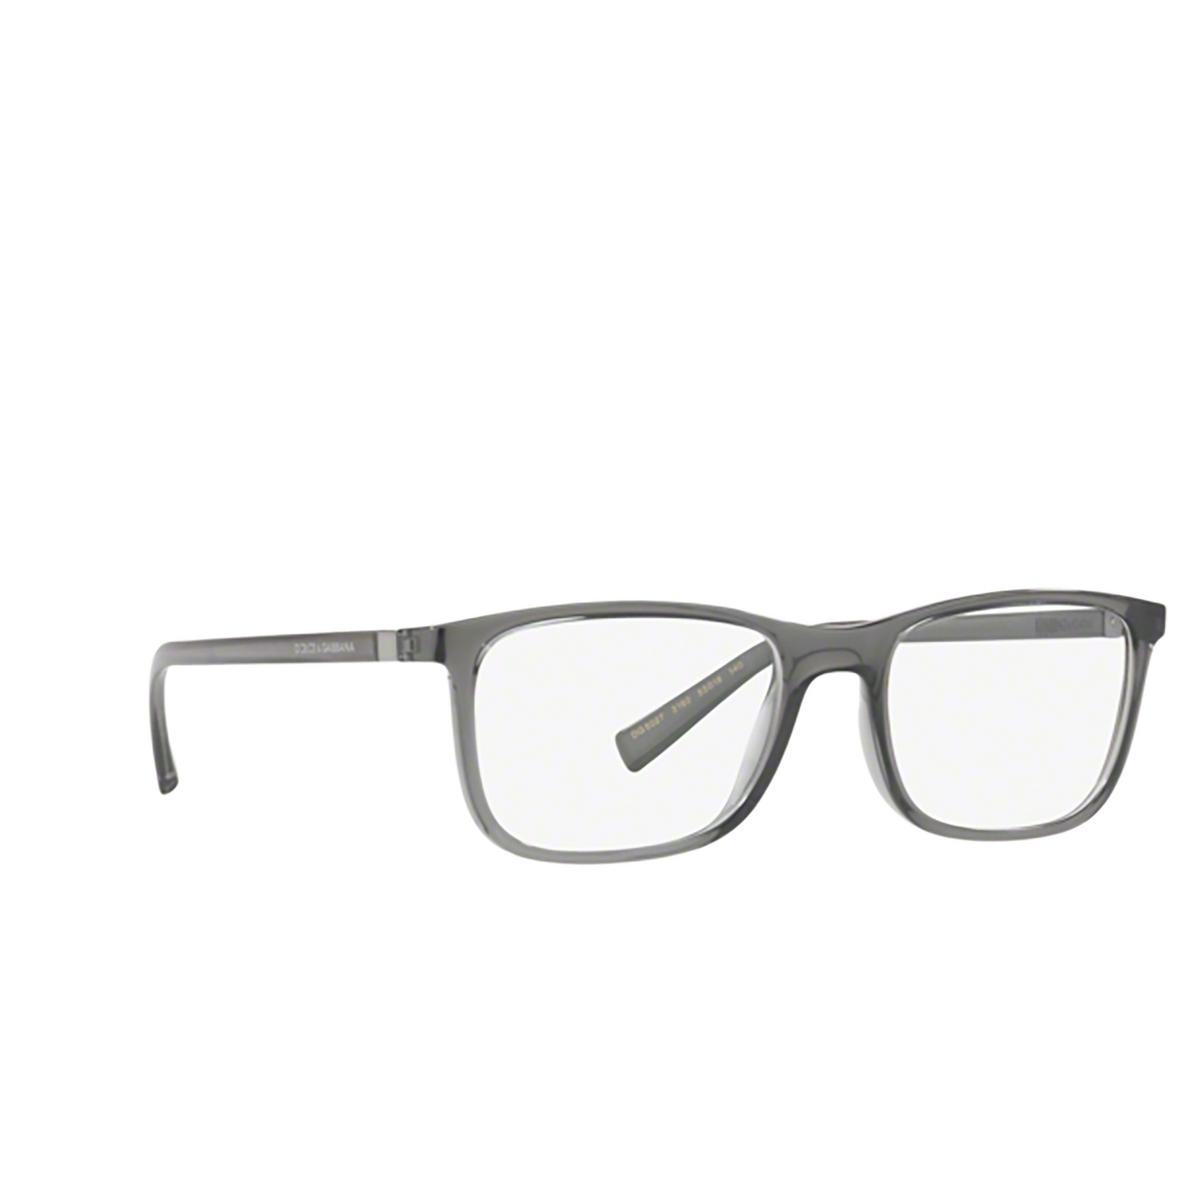 Dolce & Gabbana® Square Eyeglasses: DG5027 color Transparent Grey 3160 - three-quarters view.